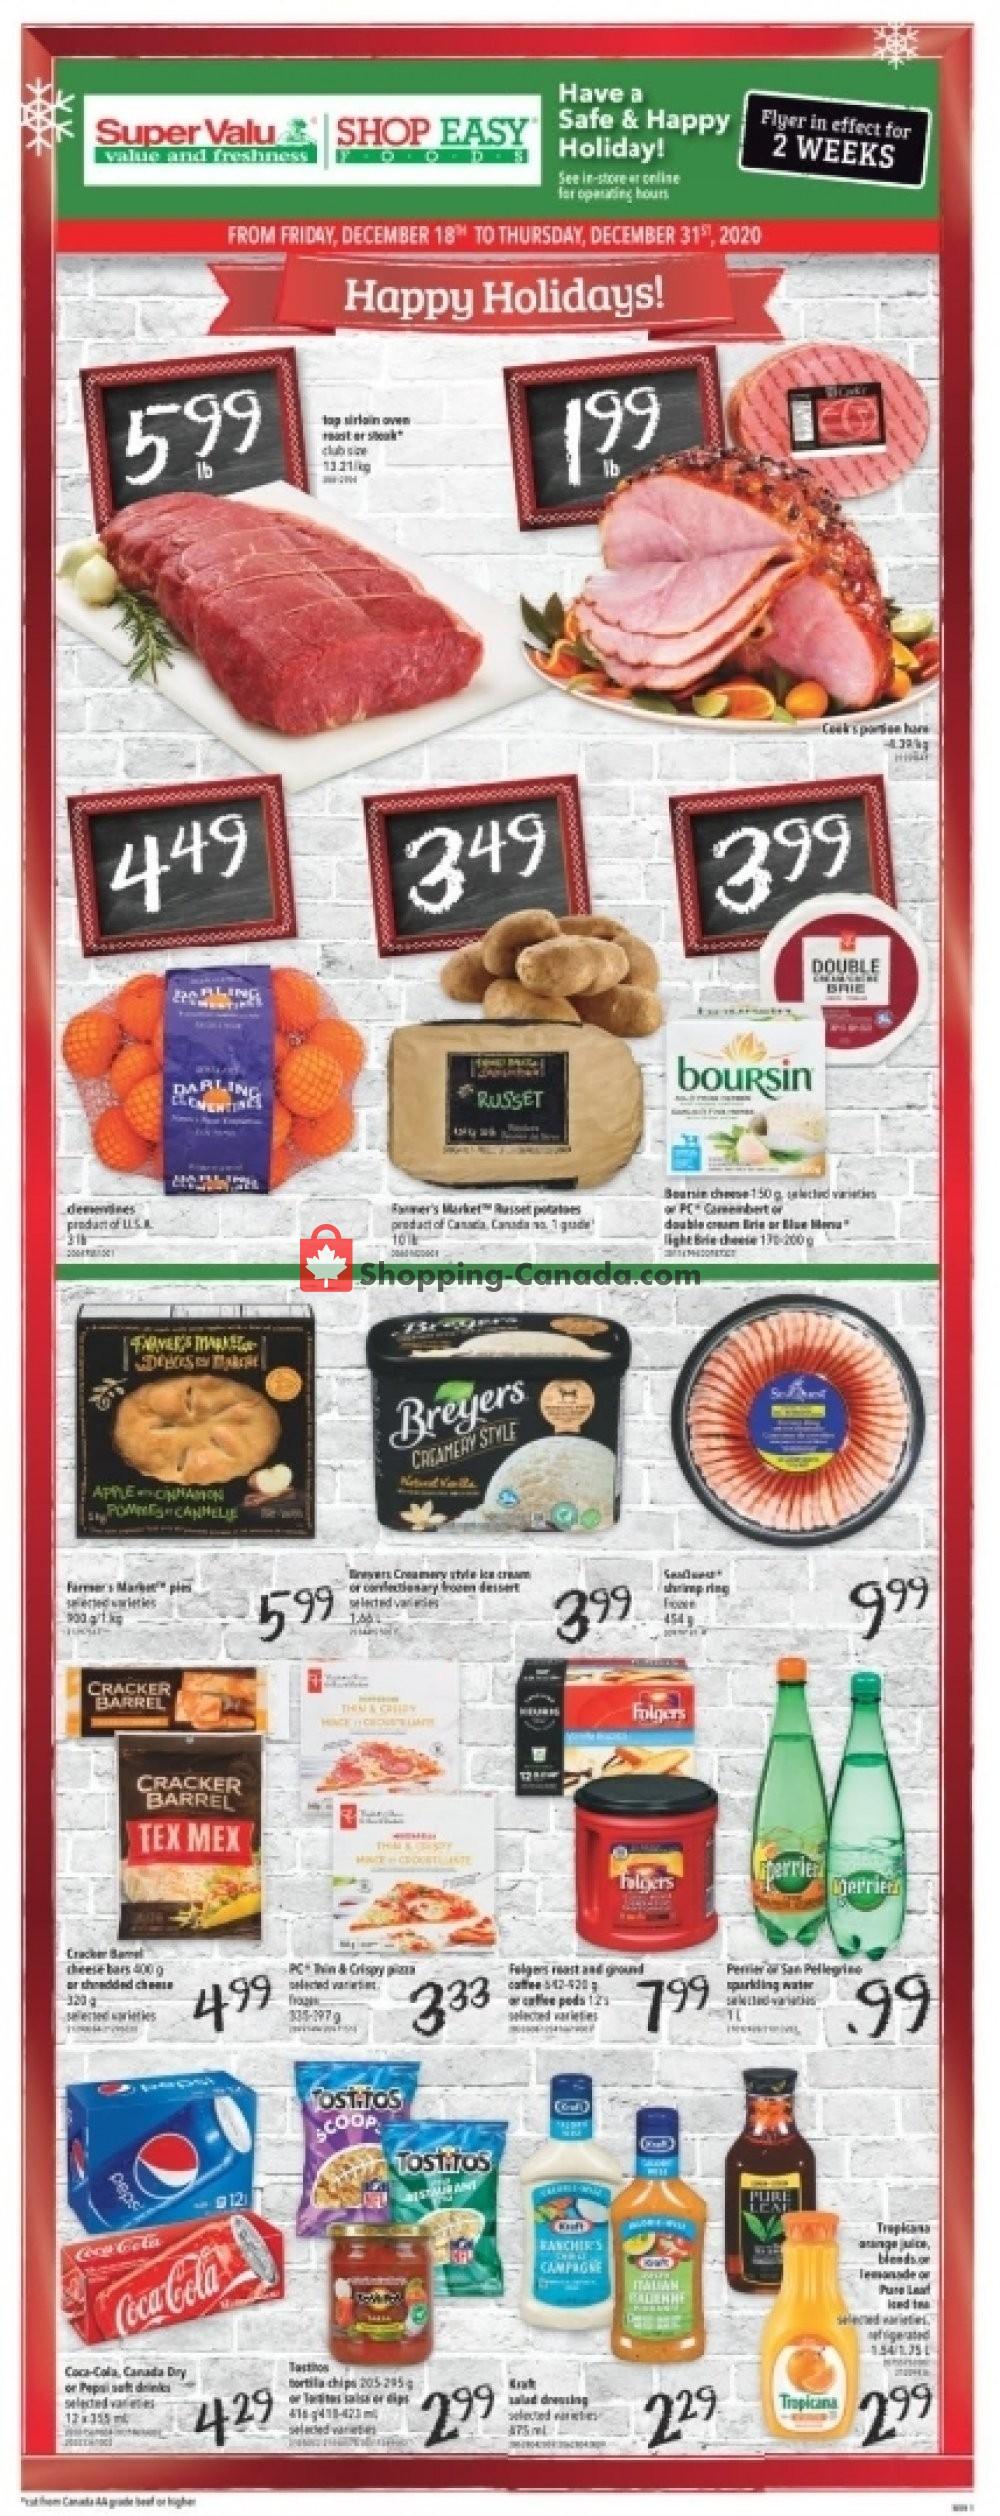 Flyer Shop Easy Foods & SuperValu Canada - from Friday December 18, 2020 to Thursday December 31, 2020